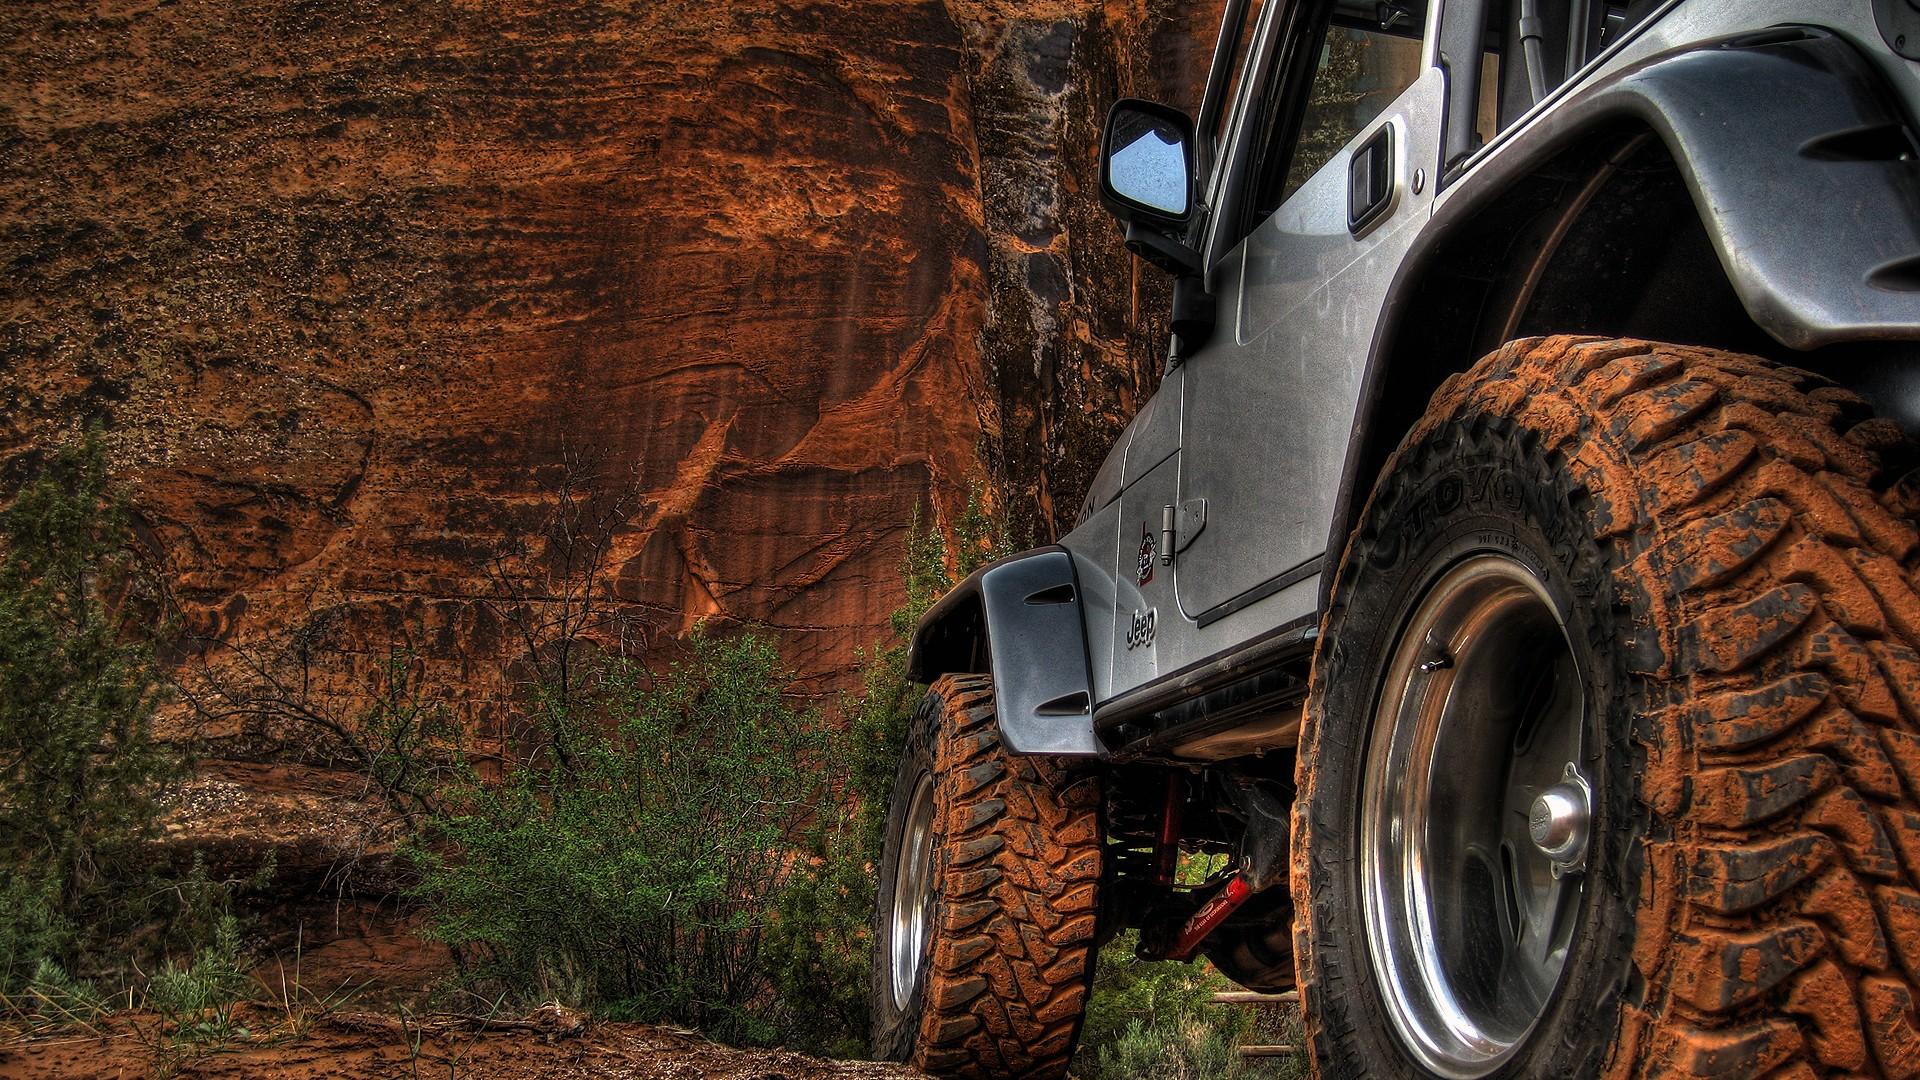 Hd wallpaper jeep - Vehicles Jeep Wrangler Vehicle Car Jeep Wallpaper